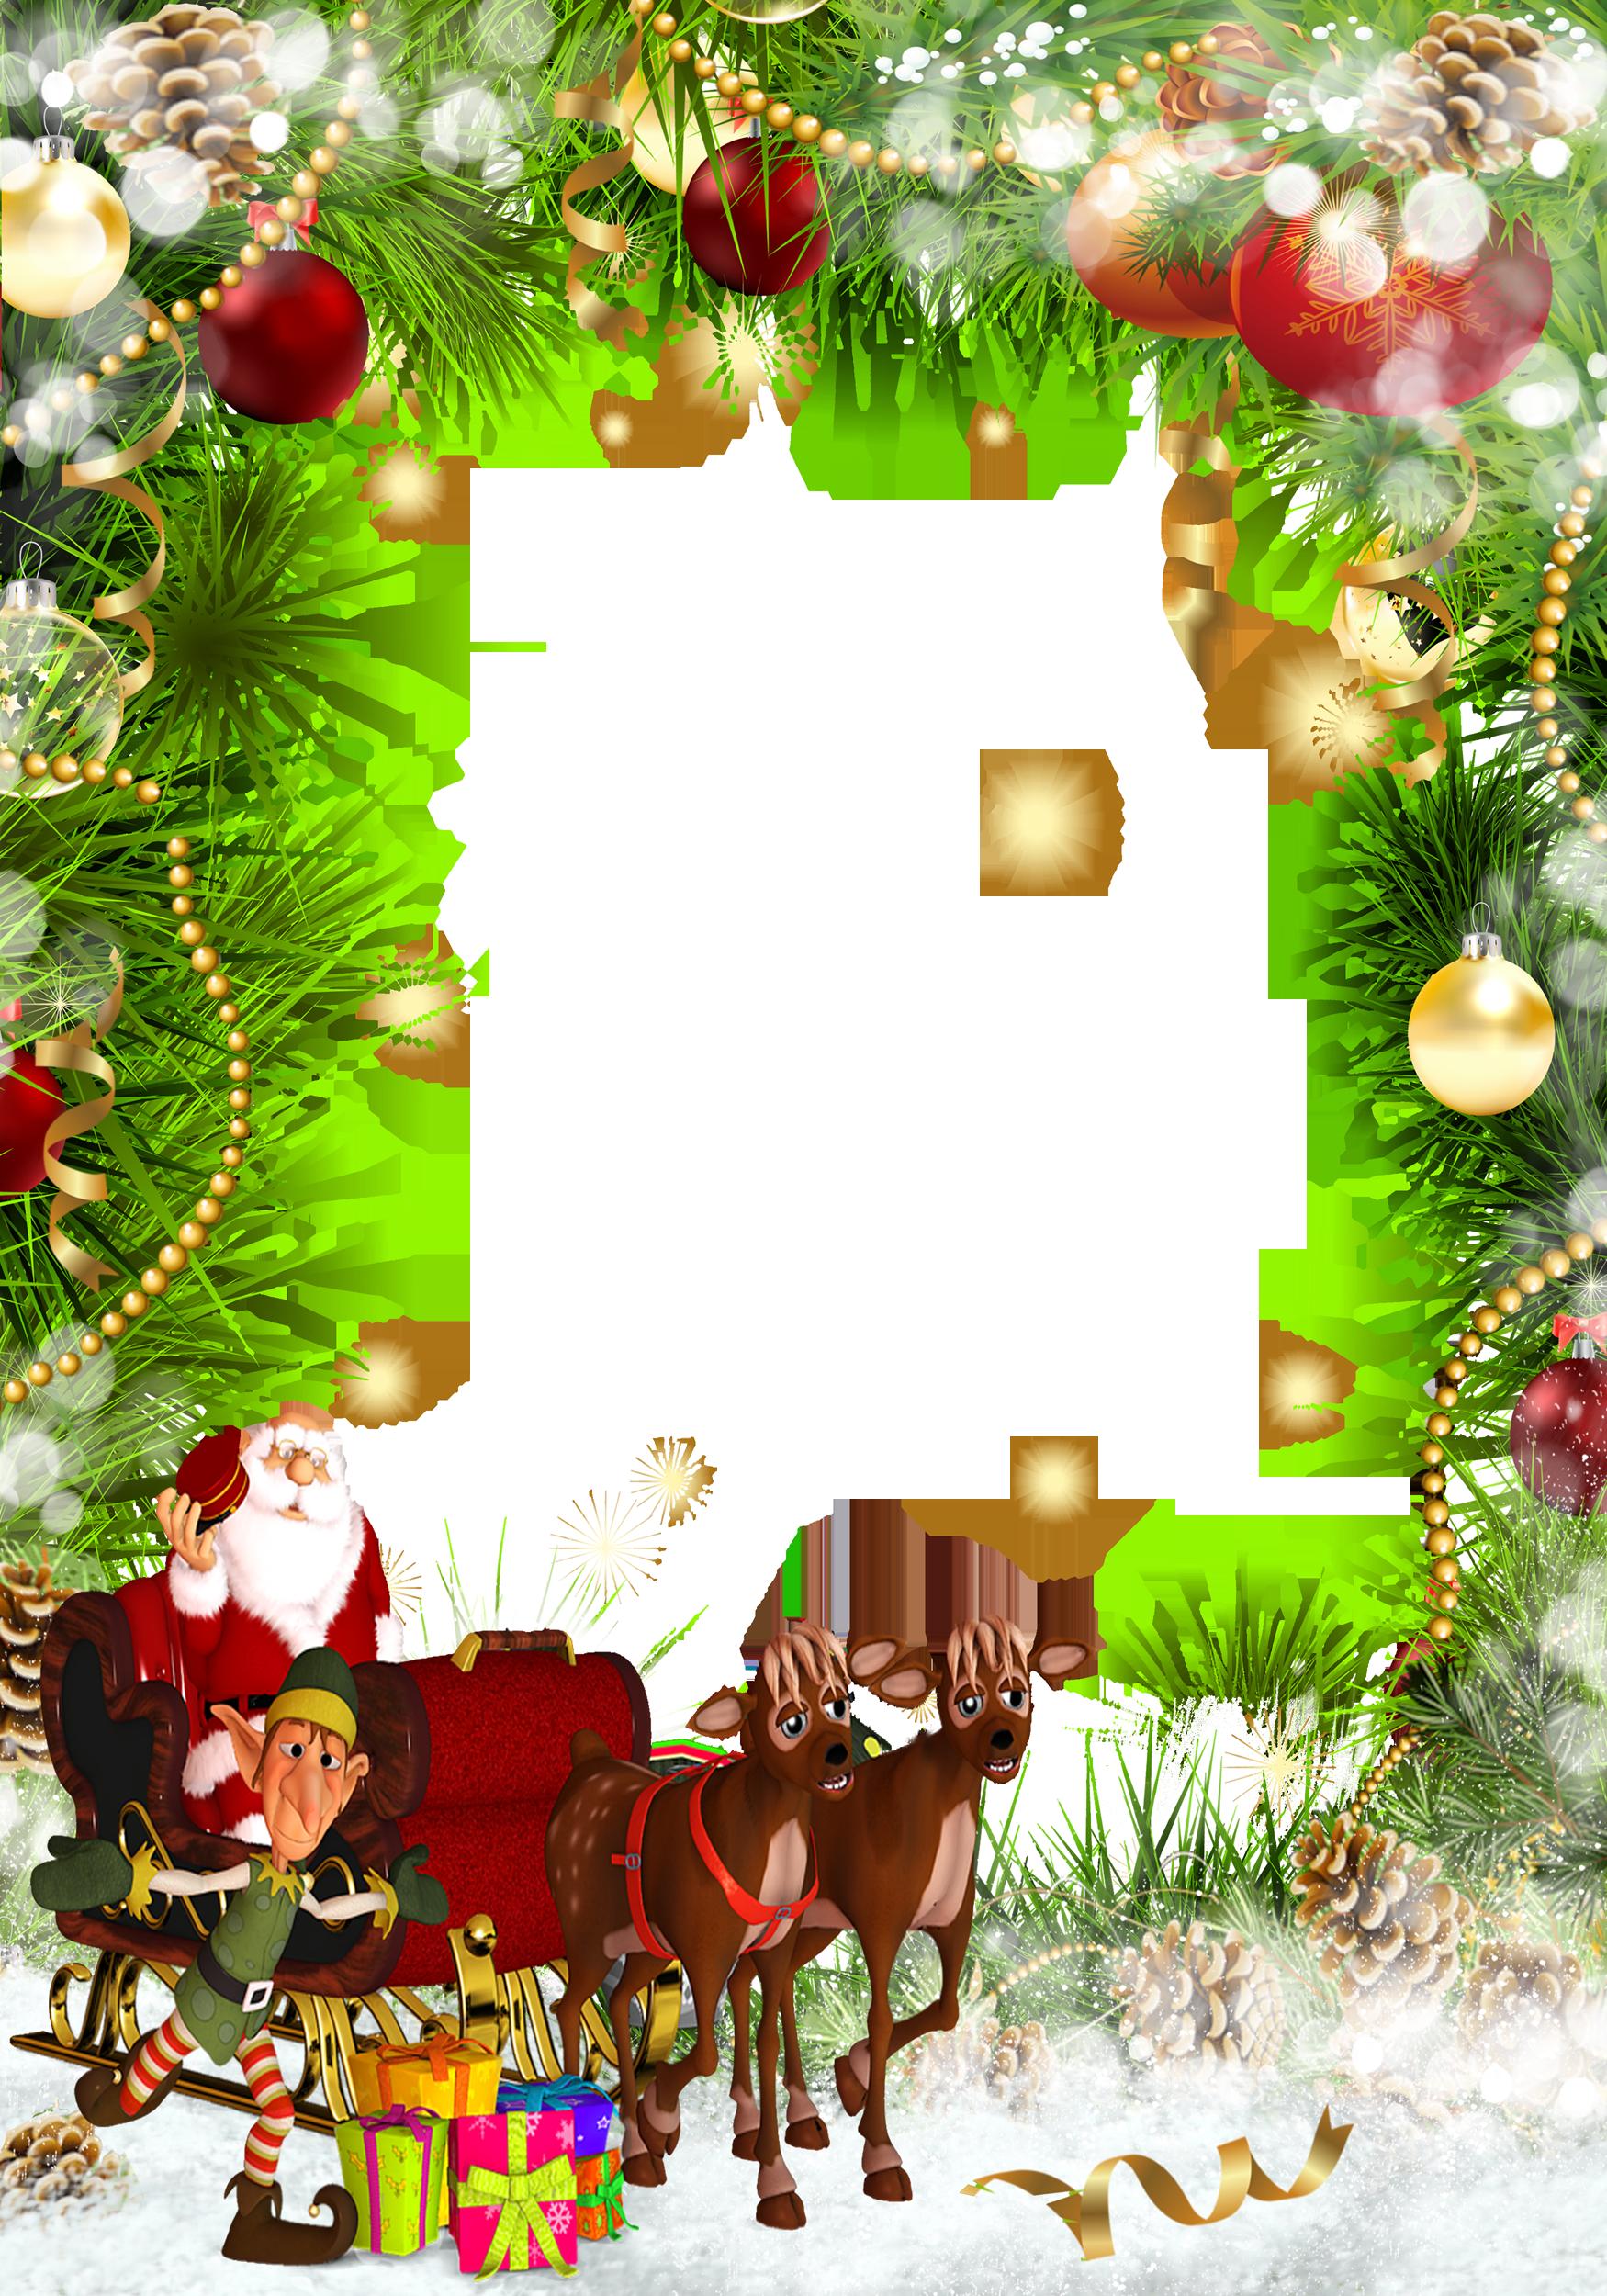 Christmas frames clipart free dowload.